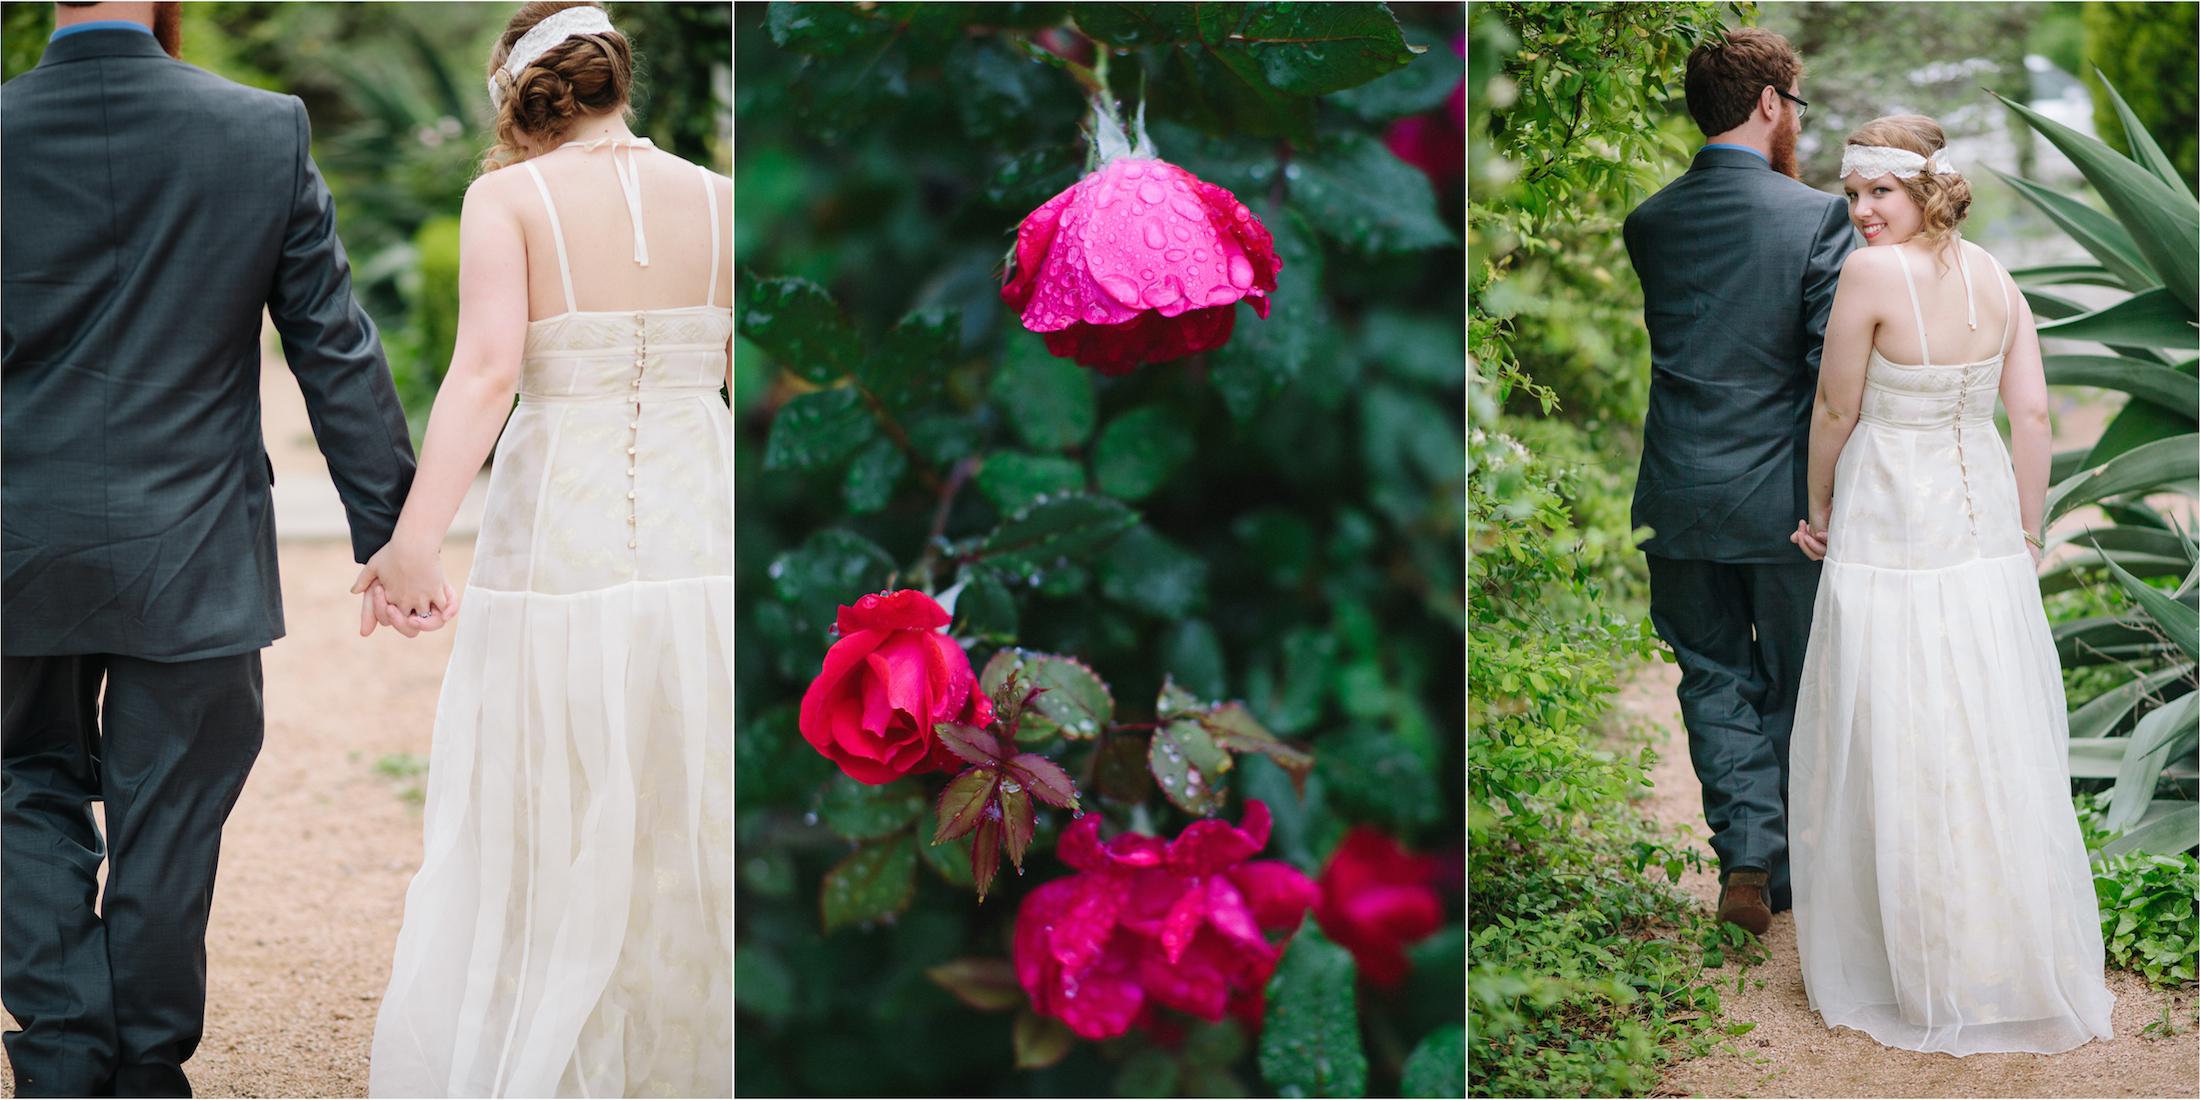 VOTIVE | Barr Mansion Wedding in Austin, Texas. Jenna + Nathan Married